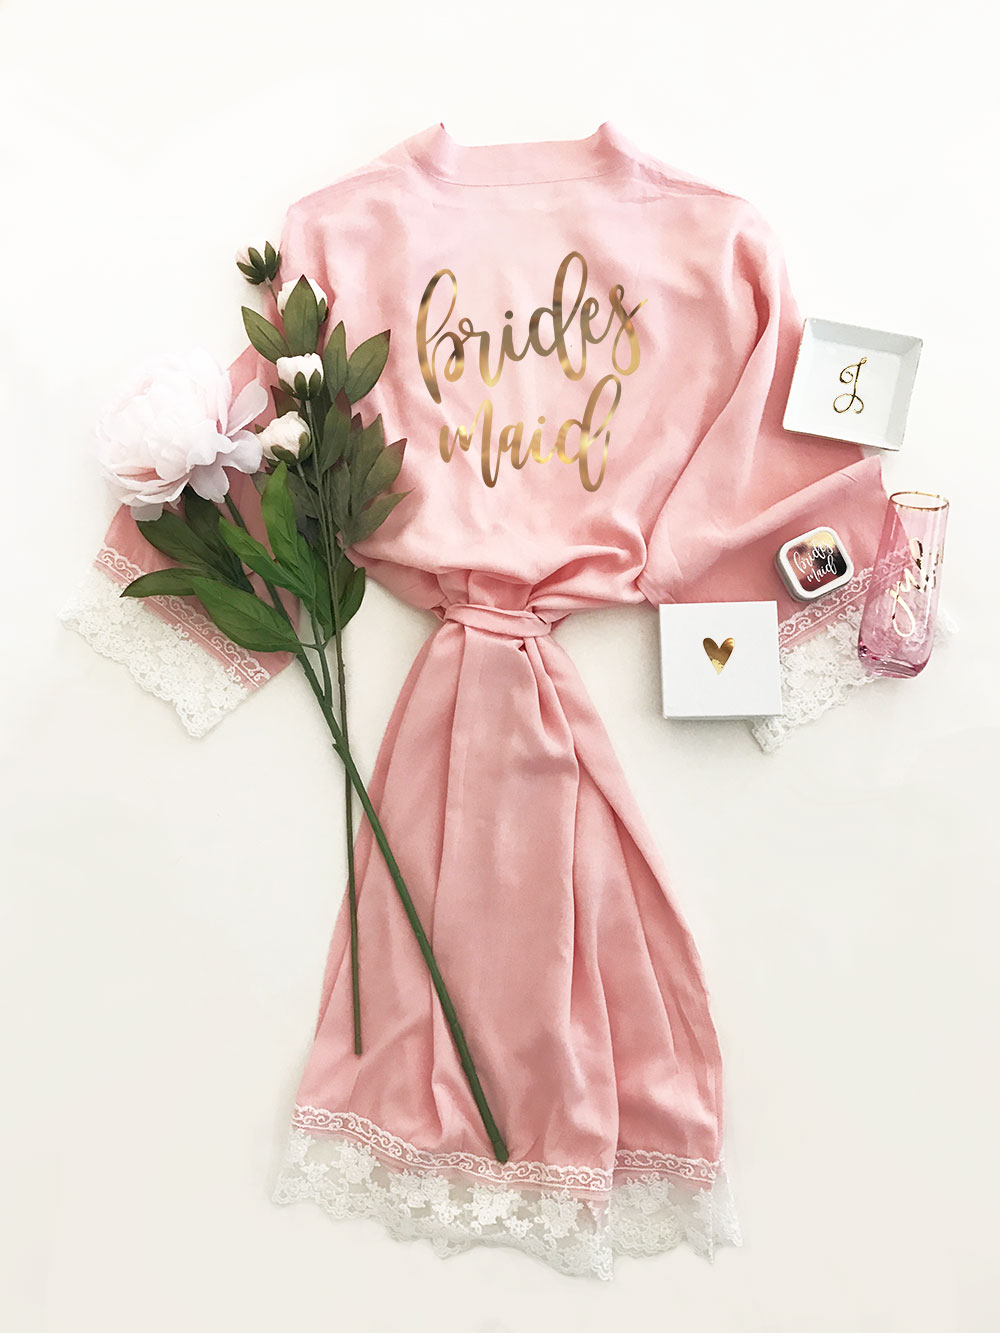 Cotton Lace Robes - Bridal Party